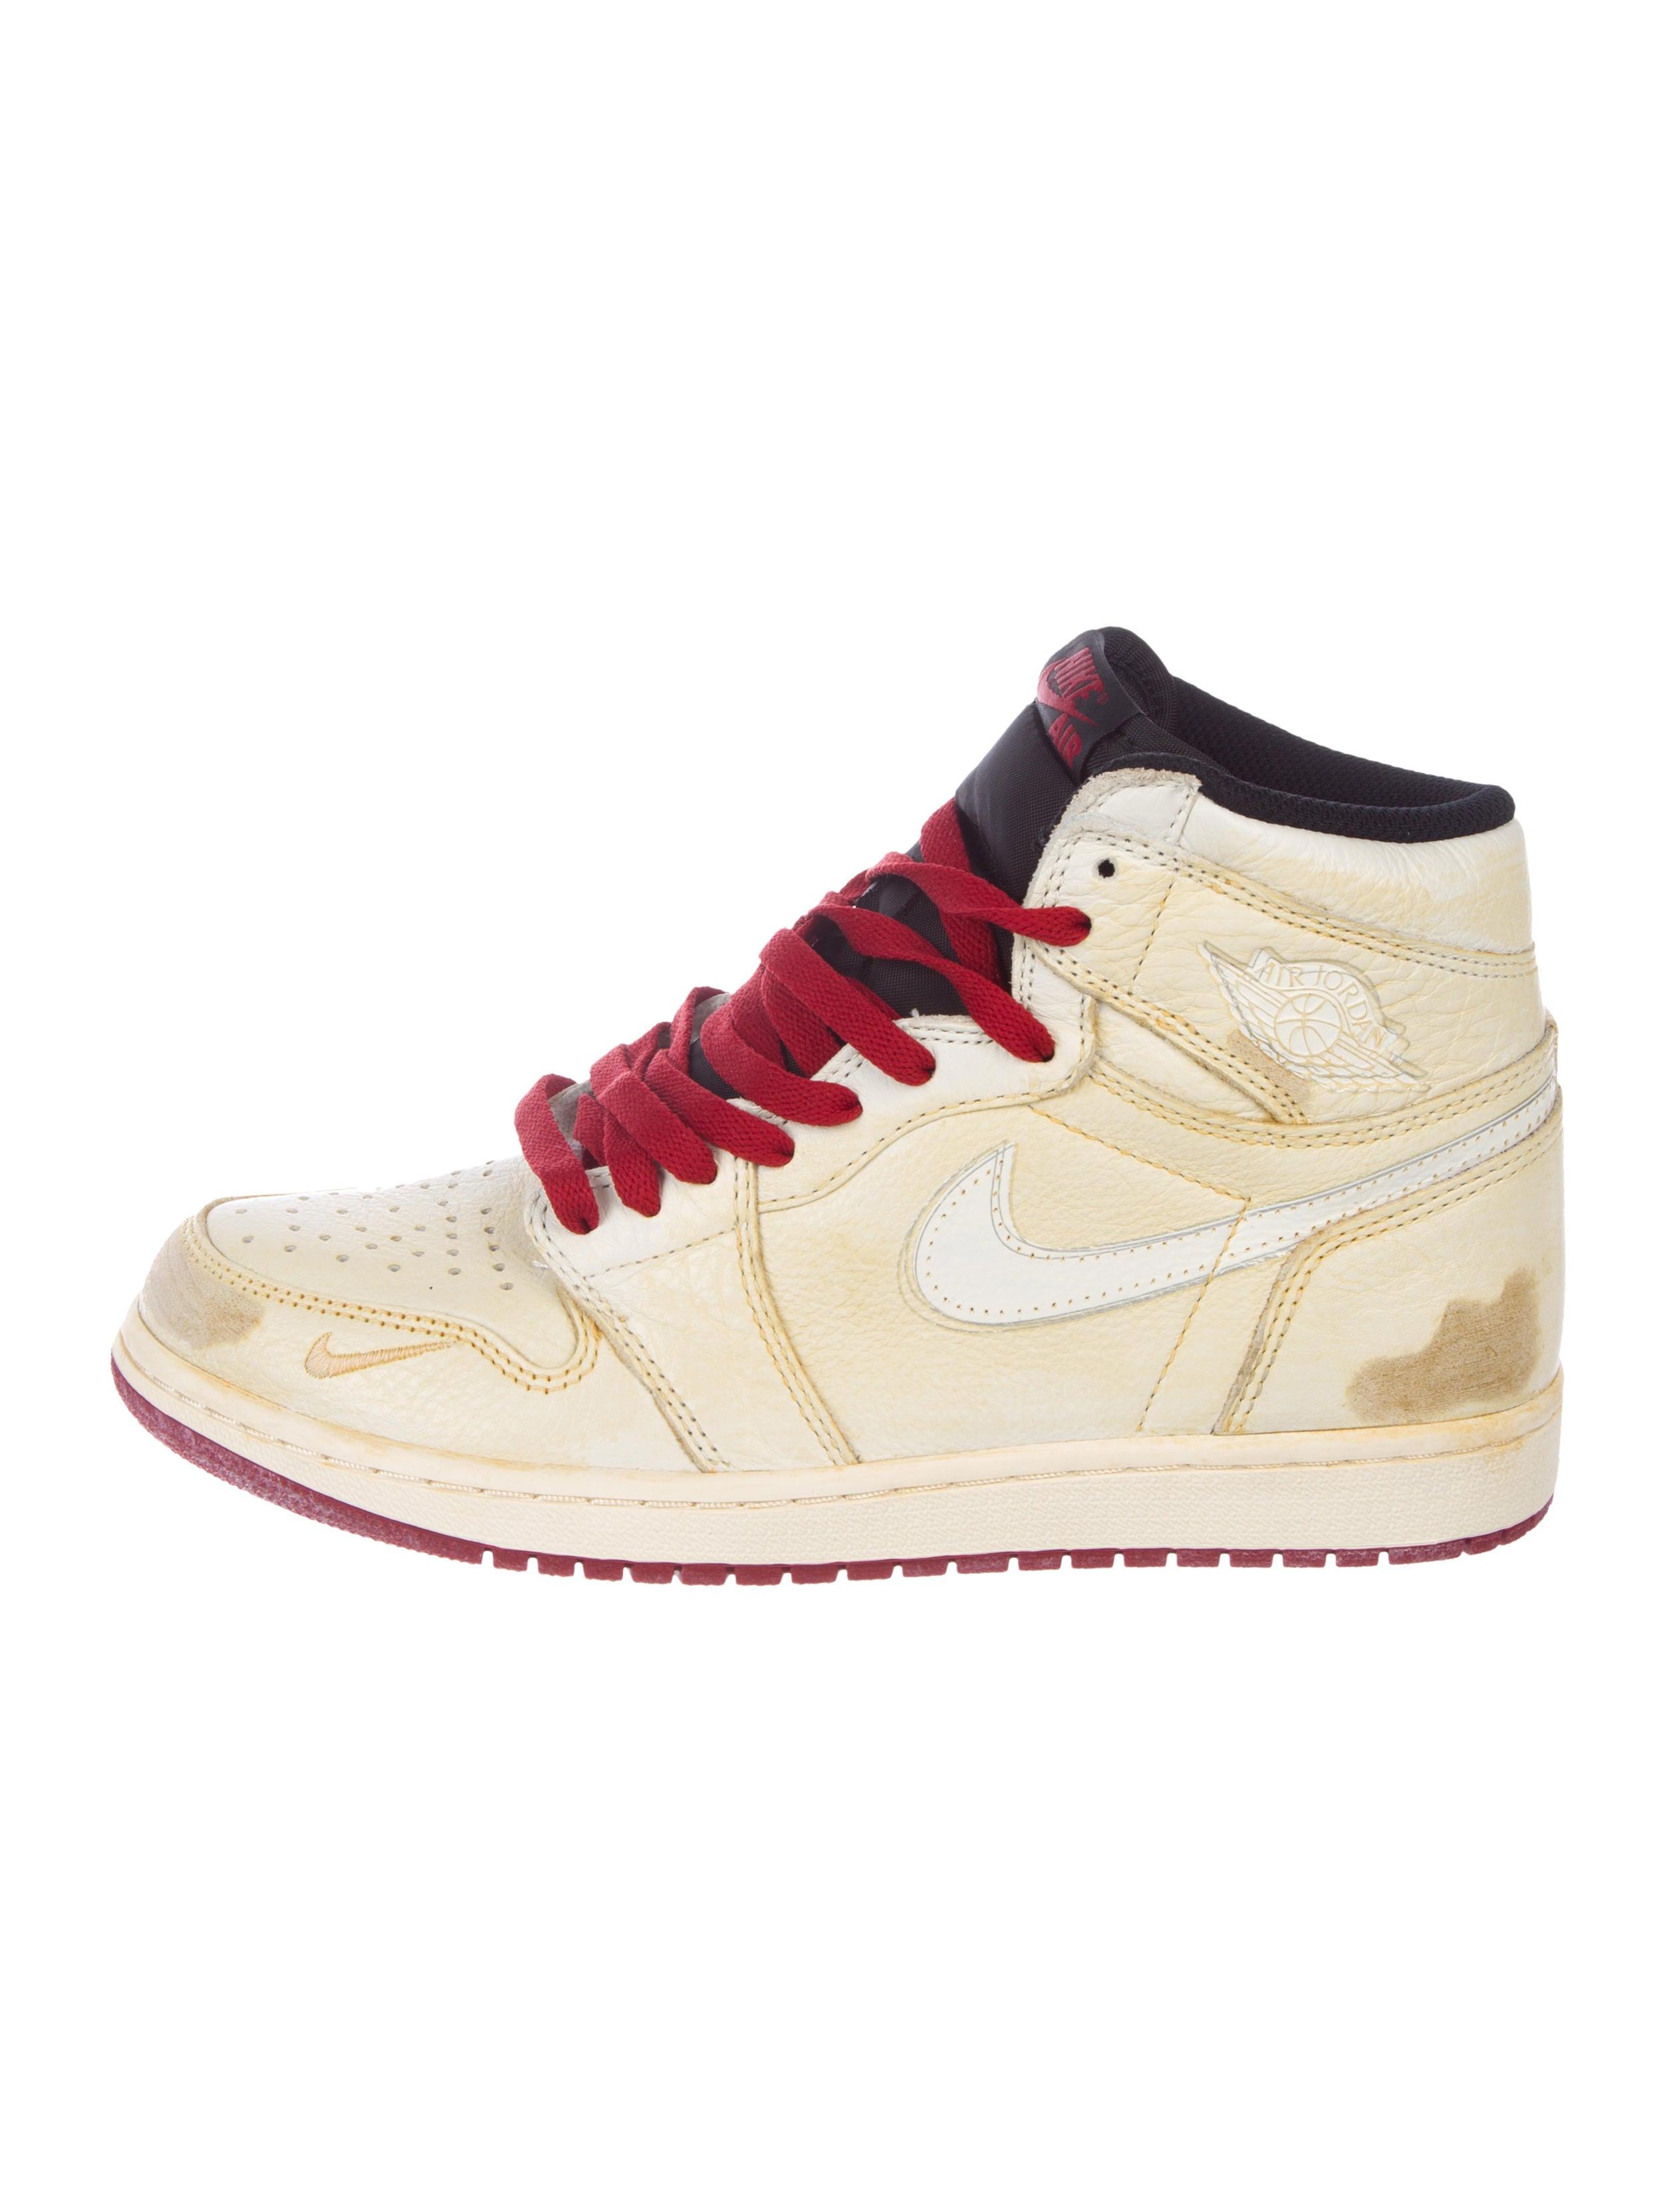 eea1a1cf5dc325 Jordan 1 Retro High  Nigel Sylvester  Sneakers - Shoes - WJORA20864 ...